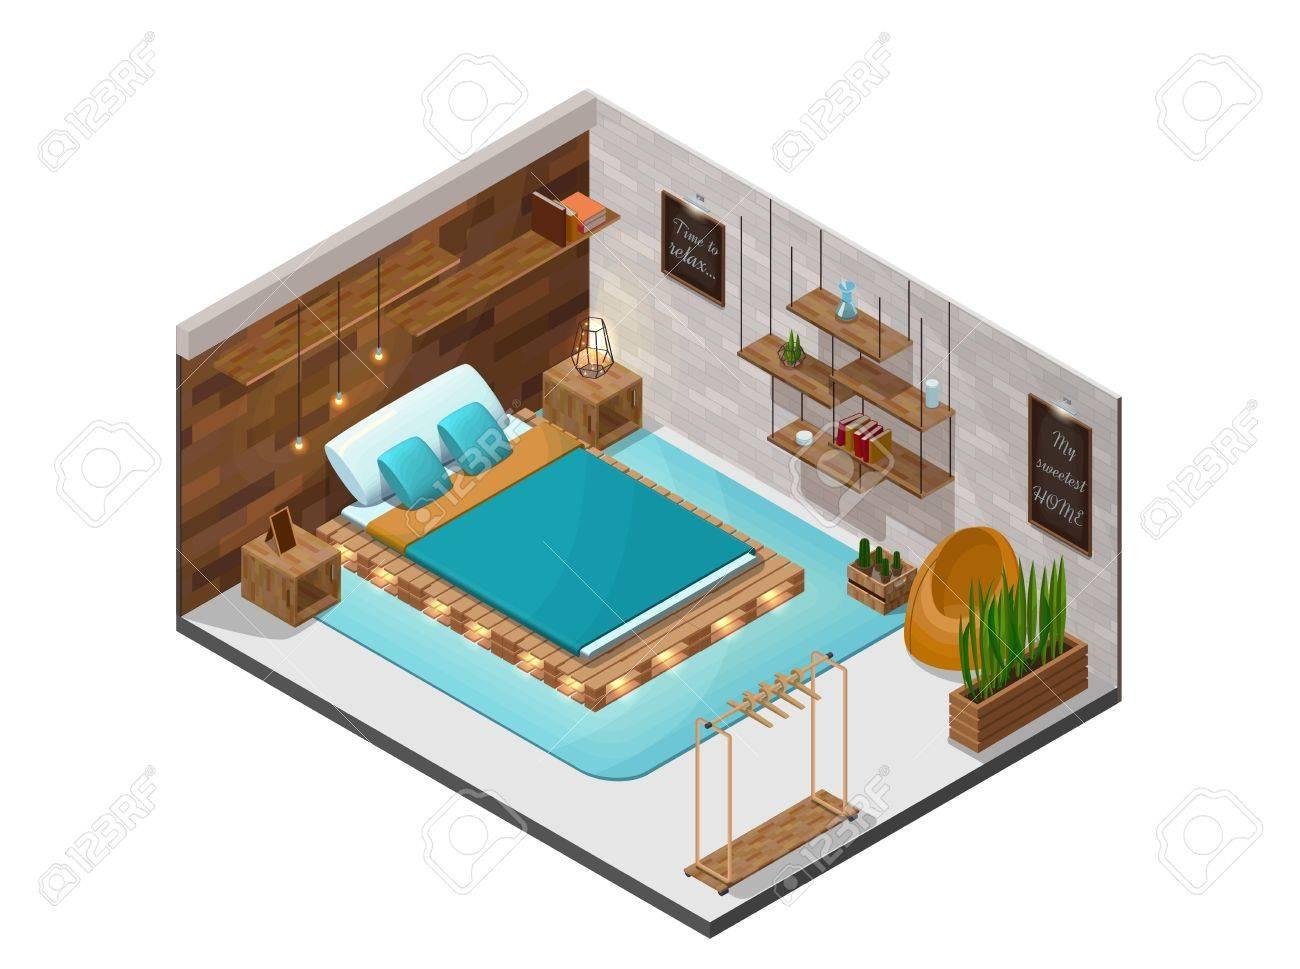 Interior wooden shelves free vector - Bedroom Isometric Infographic 3d Cozy Interior With Pallet Diy Wooden Furniture Shelf Terrarium Lamp